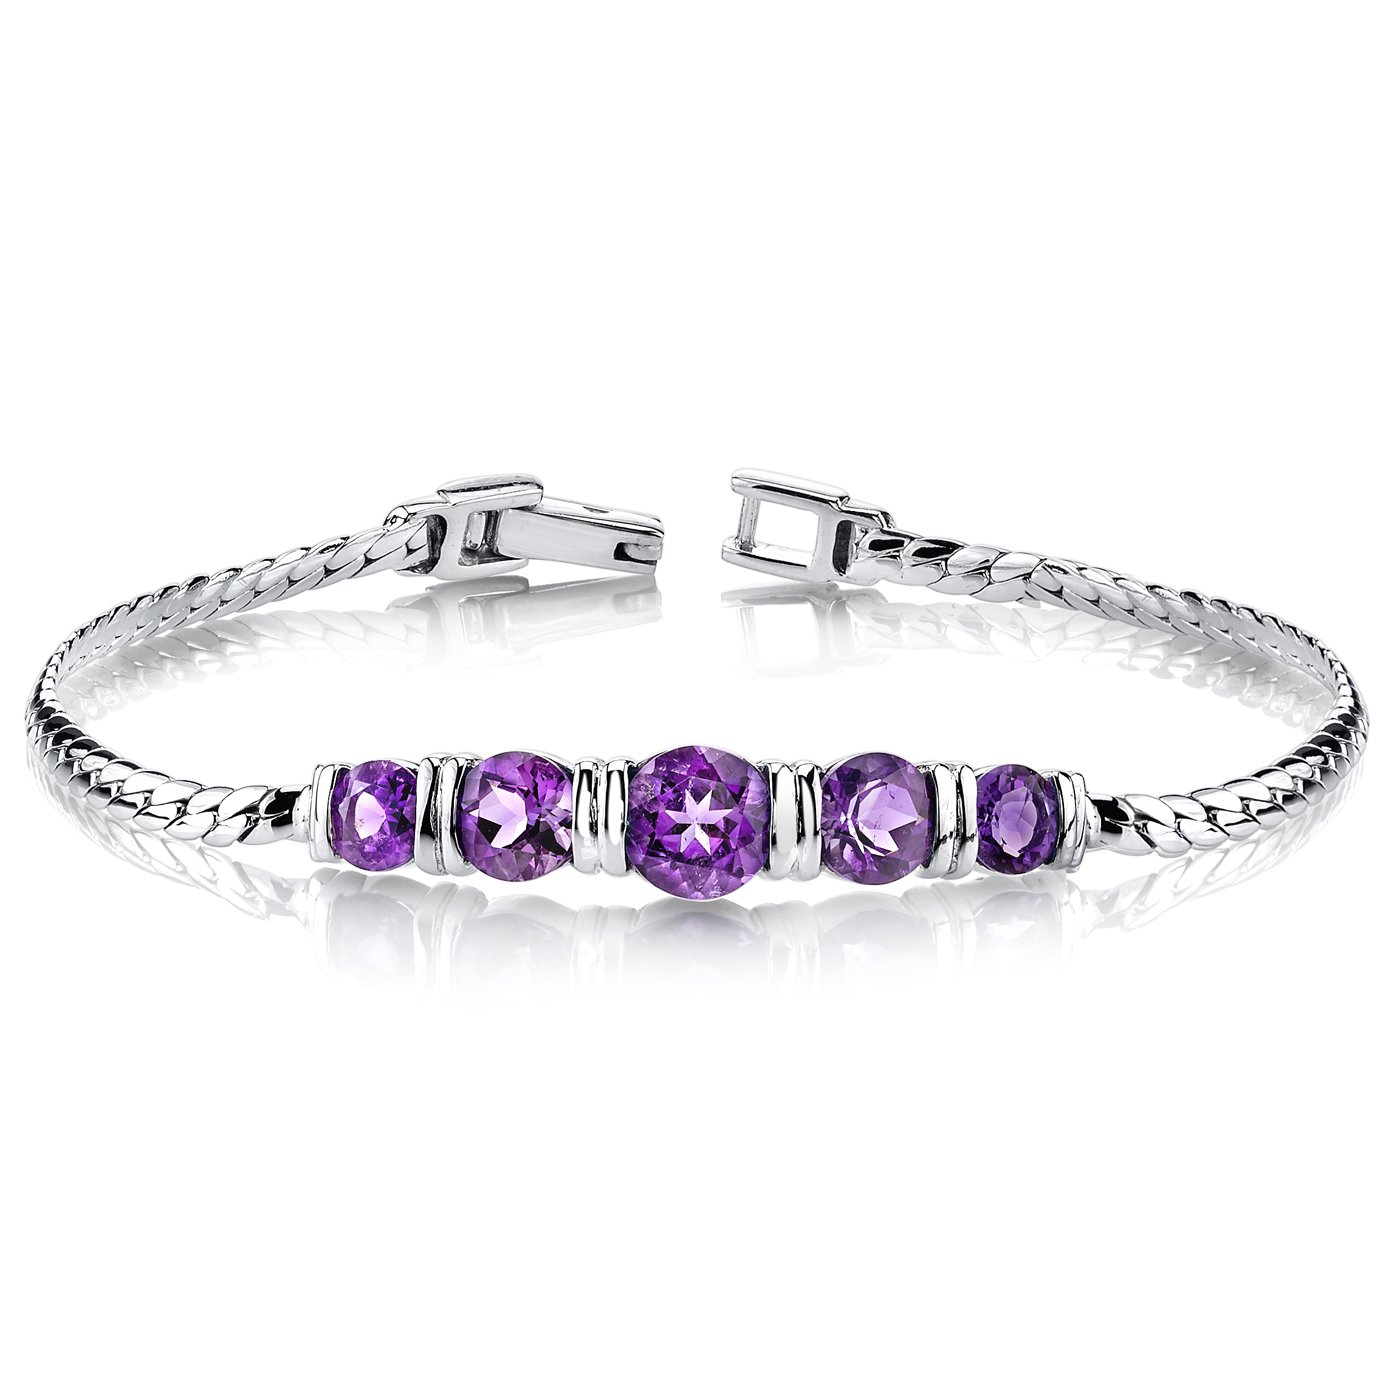 Amethyst Bracelet Sterling Silver 3.75 Carats 5 Stone Design by Peora